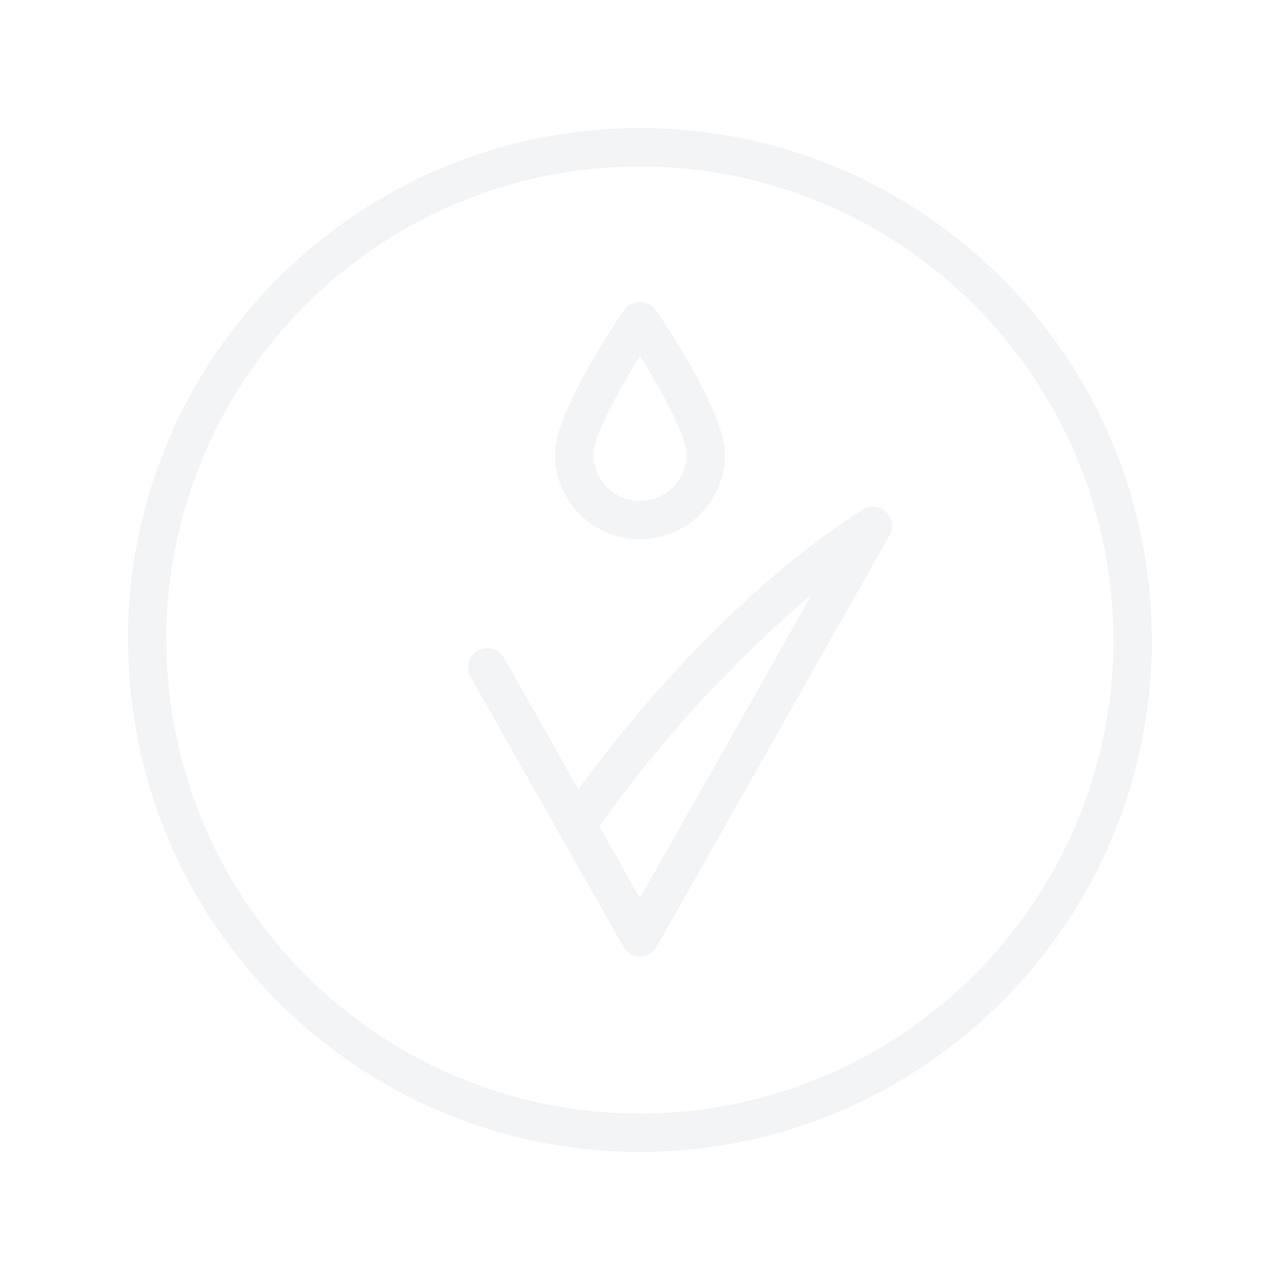 KIDS STUFF CRAZY Colour Changing Bubble Bath (Orange/Green) 300ml